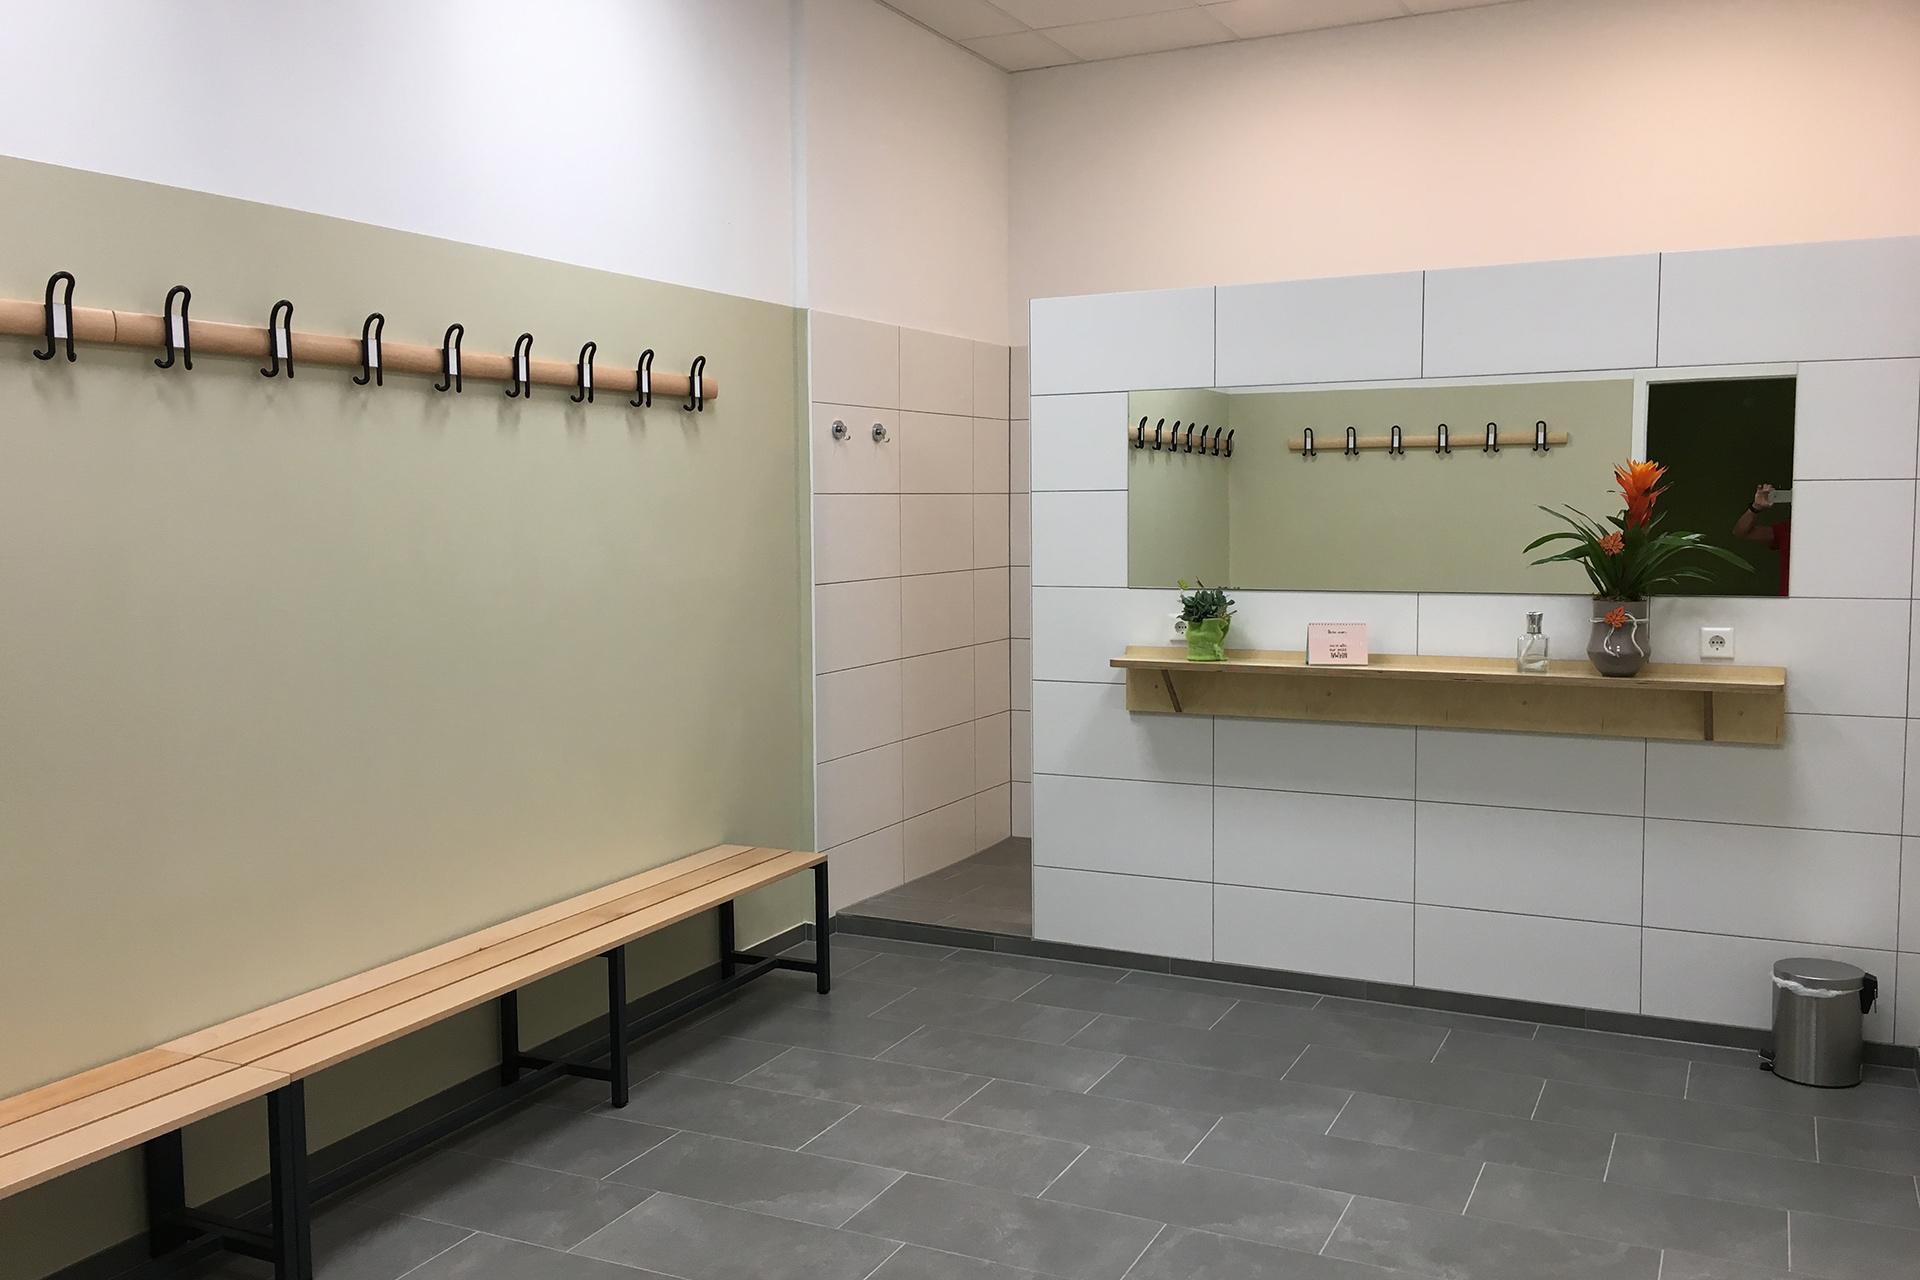 Gesundheitsstudio schön umgebaut - Schlüter Gewerbeimmobilie Lippstadt